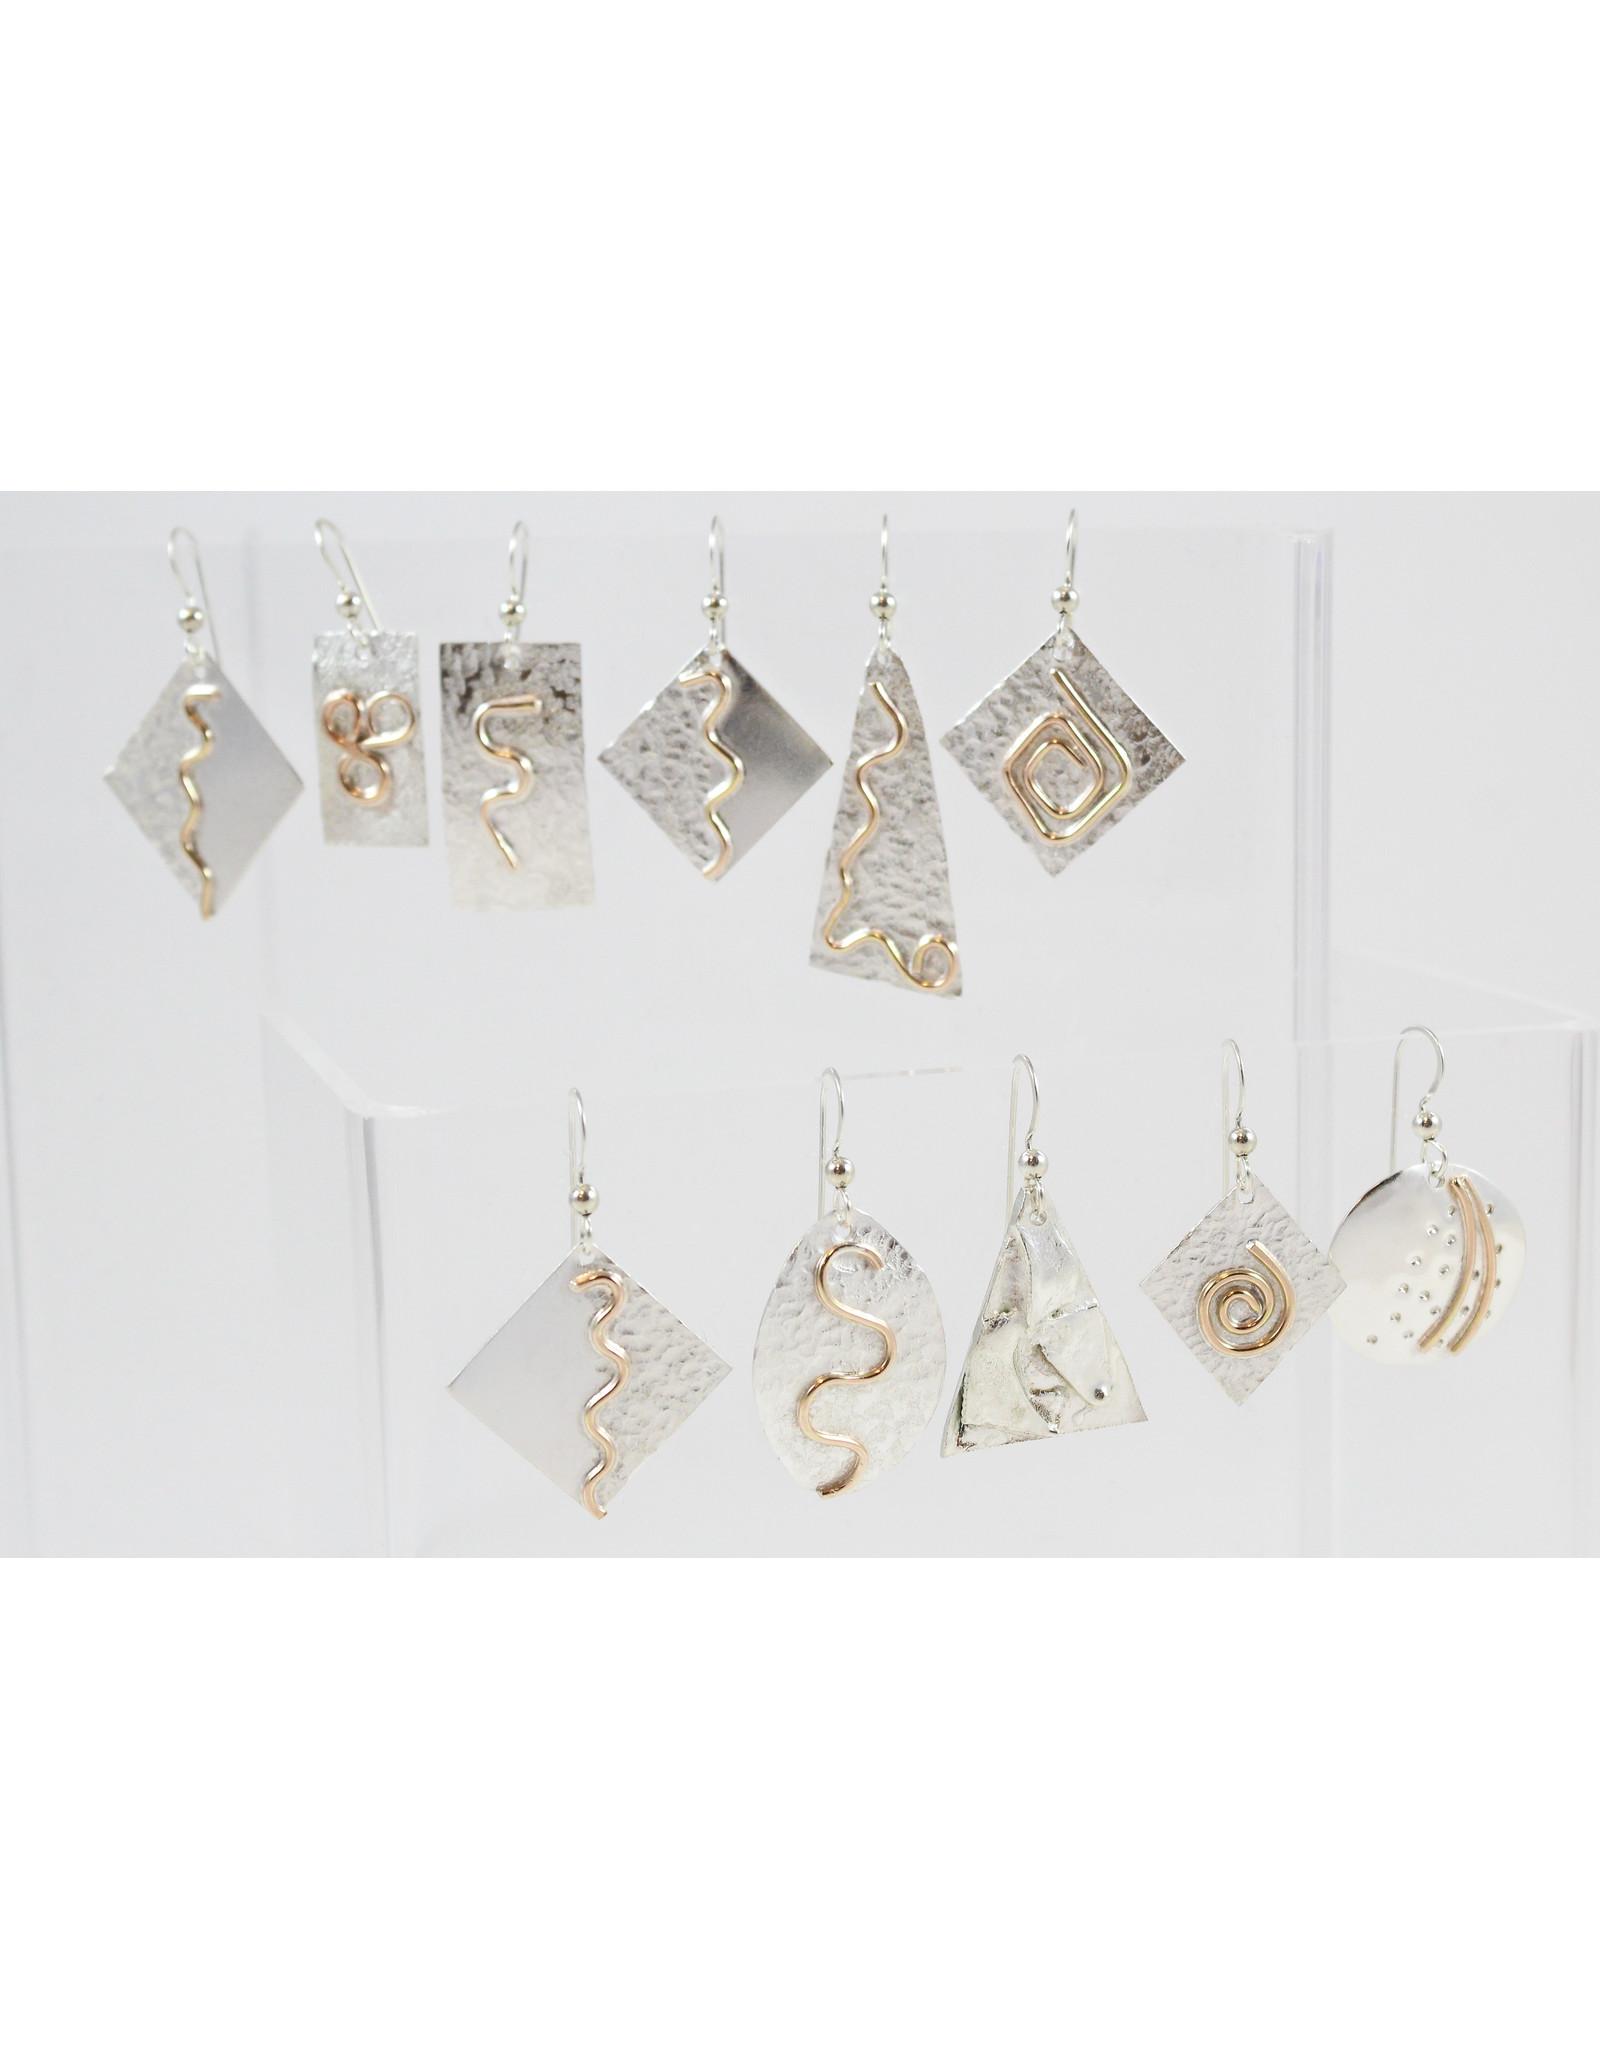 Jim & Judy MacLean Dangle Earrings by Findings for Friends